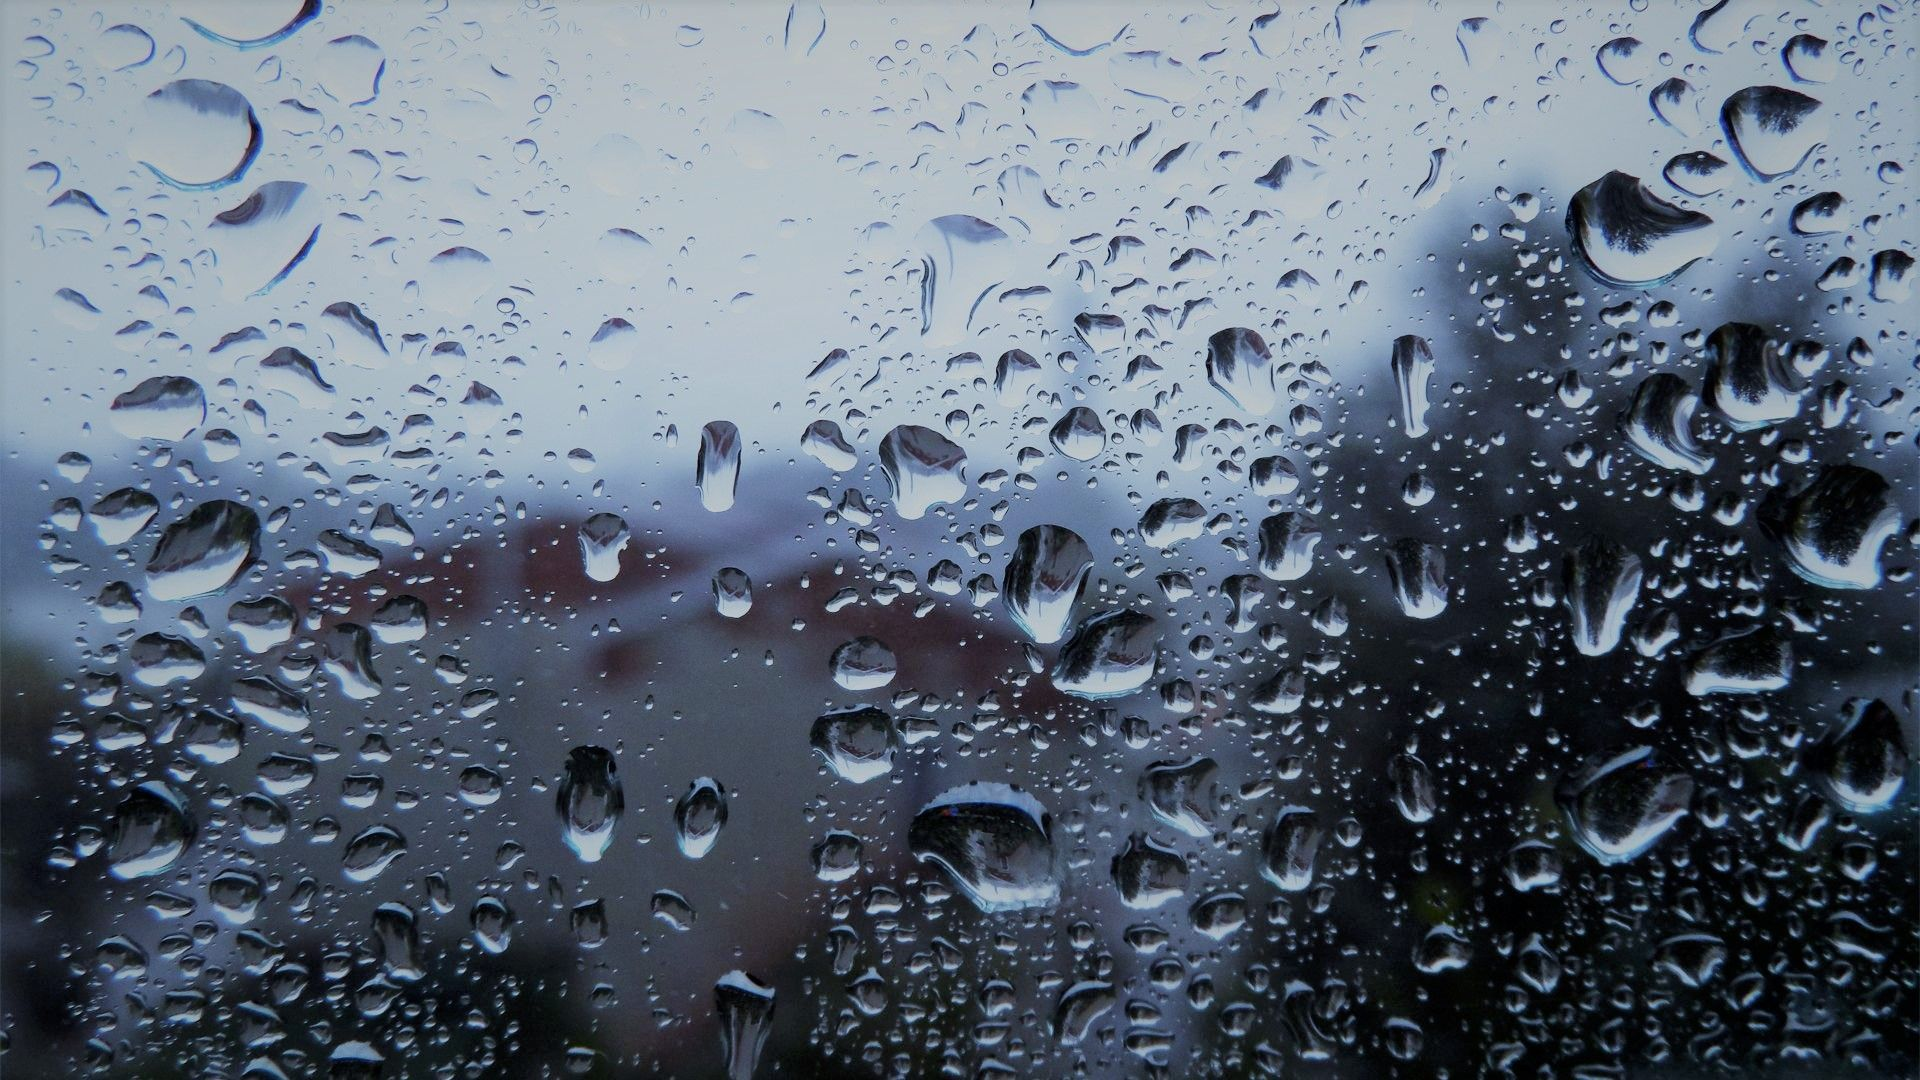 Raining Rain Window Rain Drops On Window Hd Backgrounds